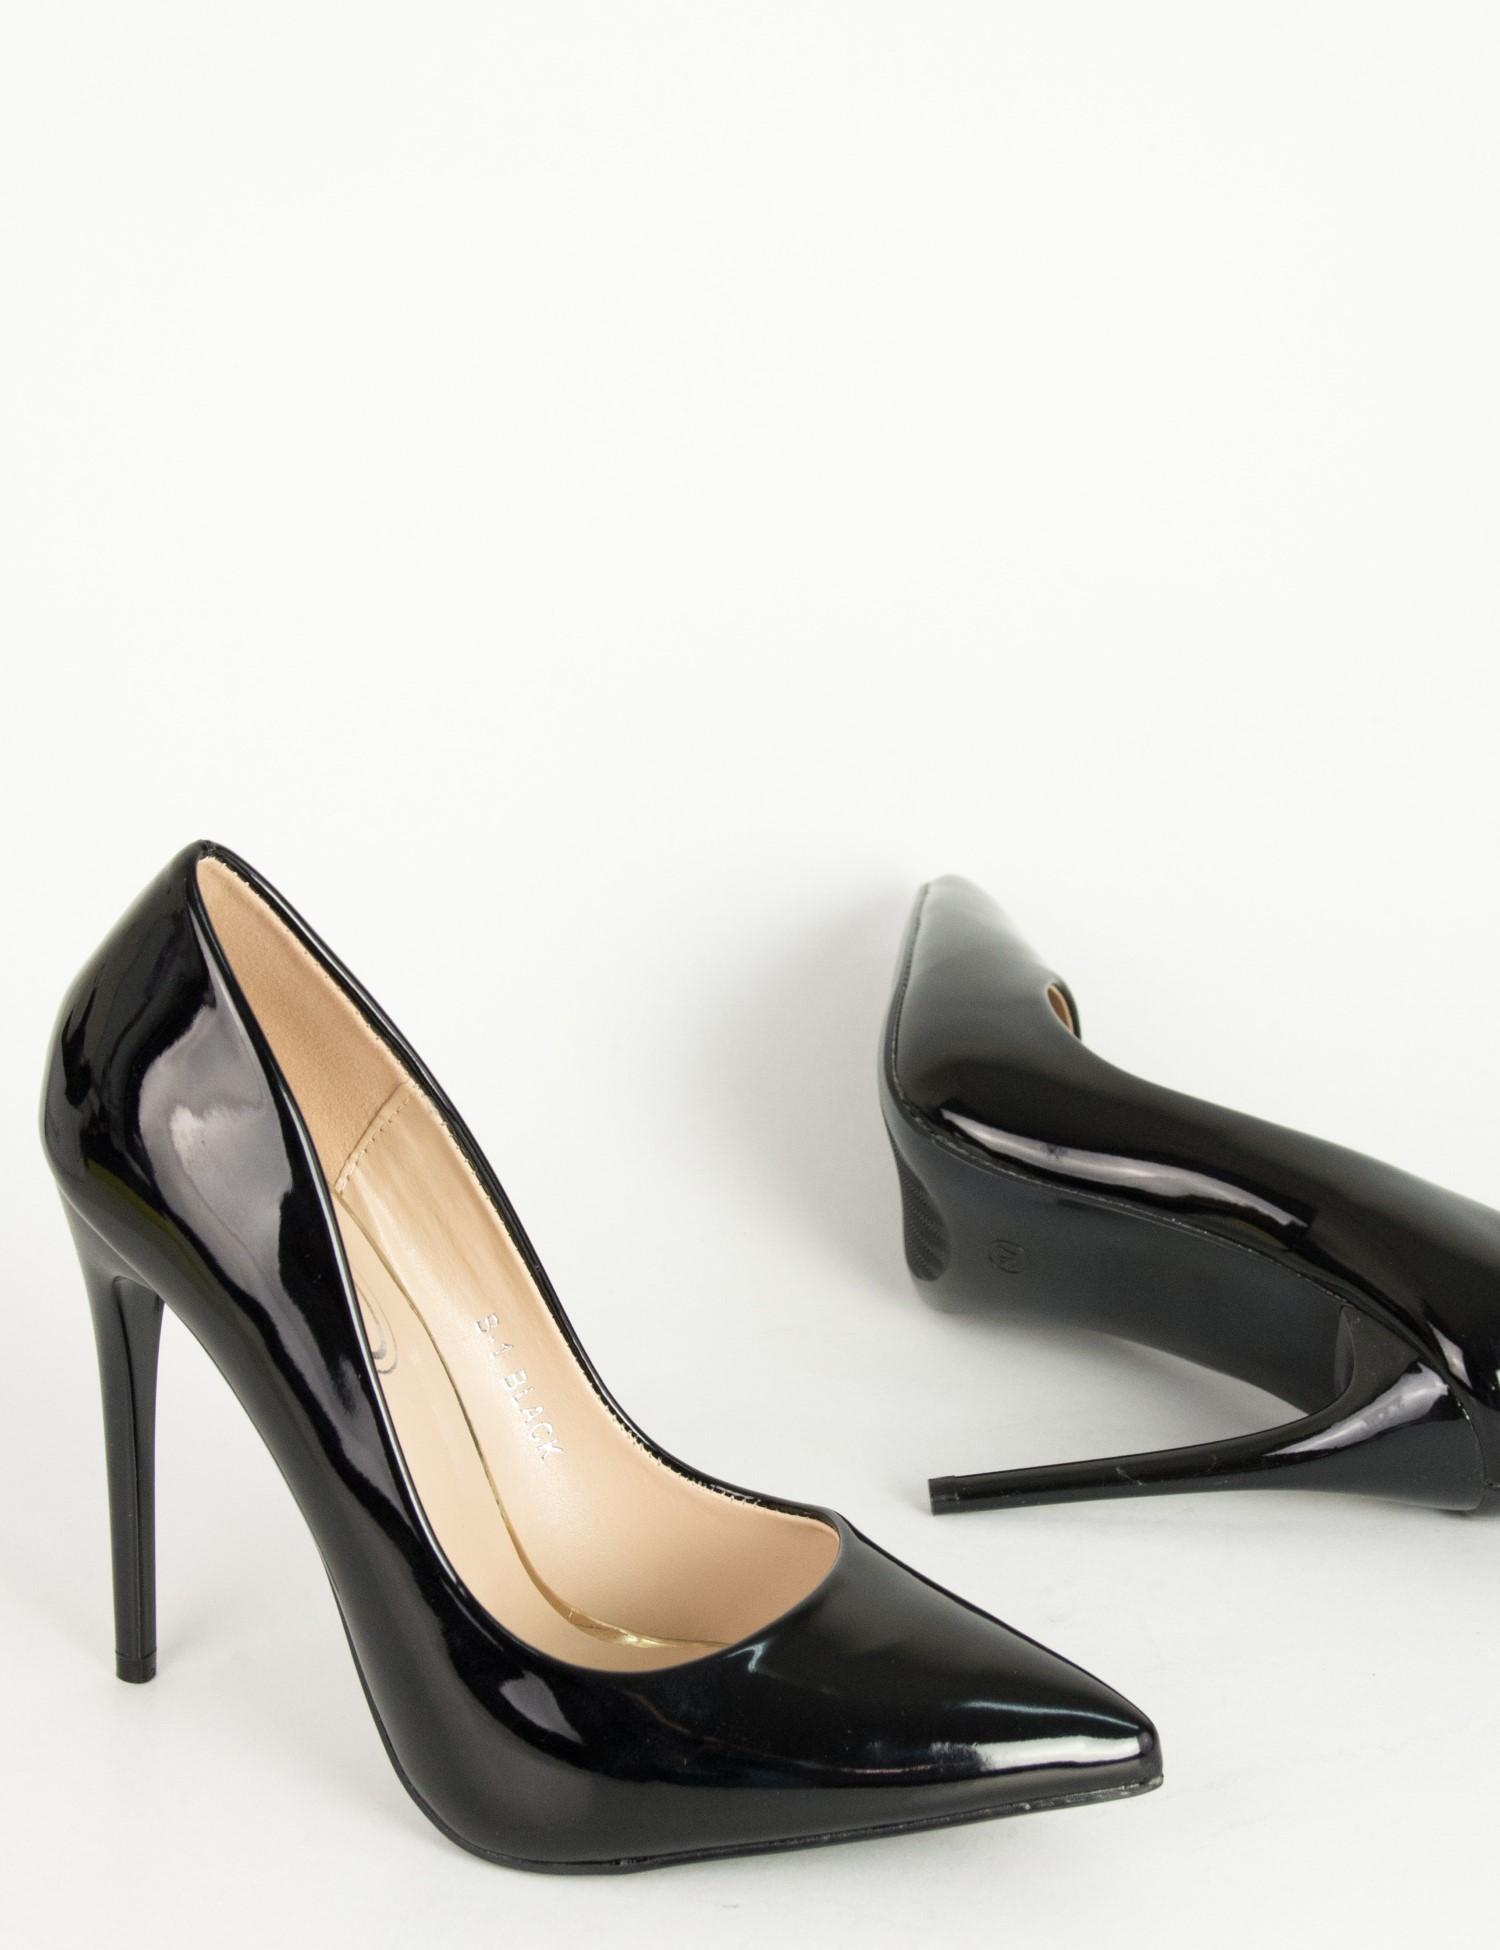 fef8f6056ae Γυναικείες μαύρες λουστρίνι ψηλοτάκουνες γόβες B18